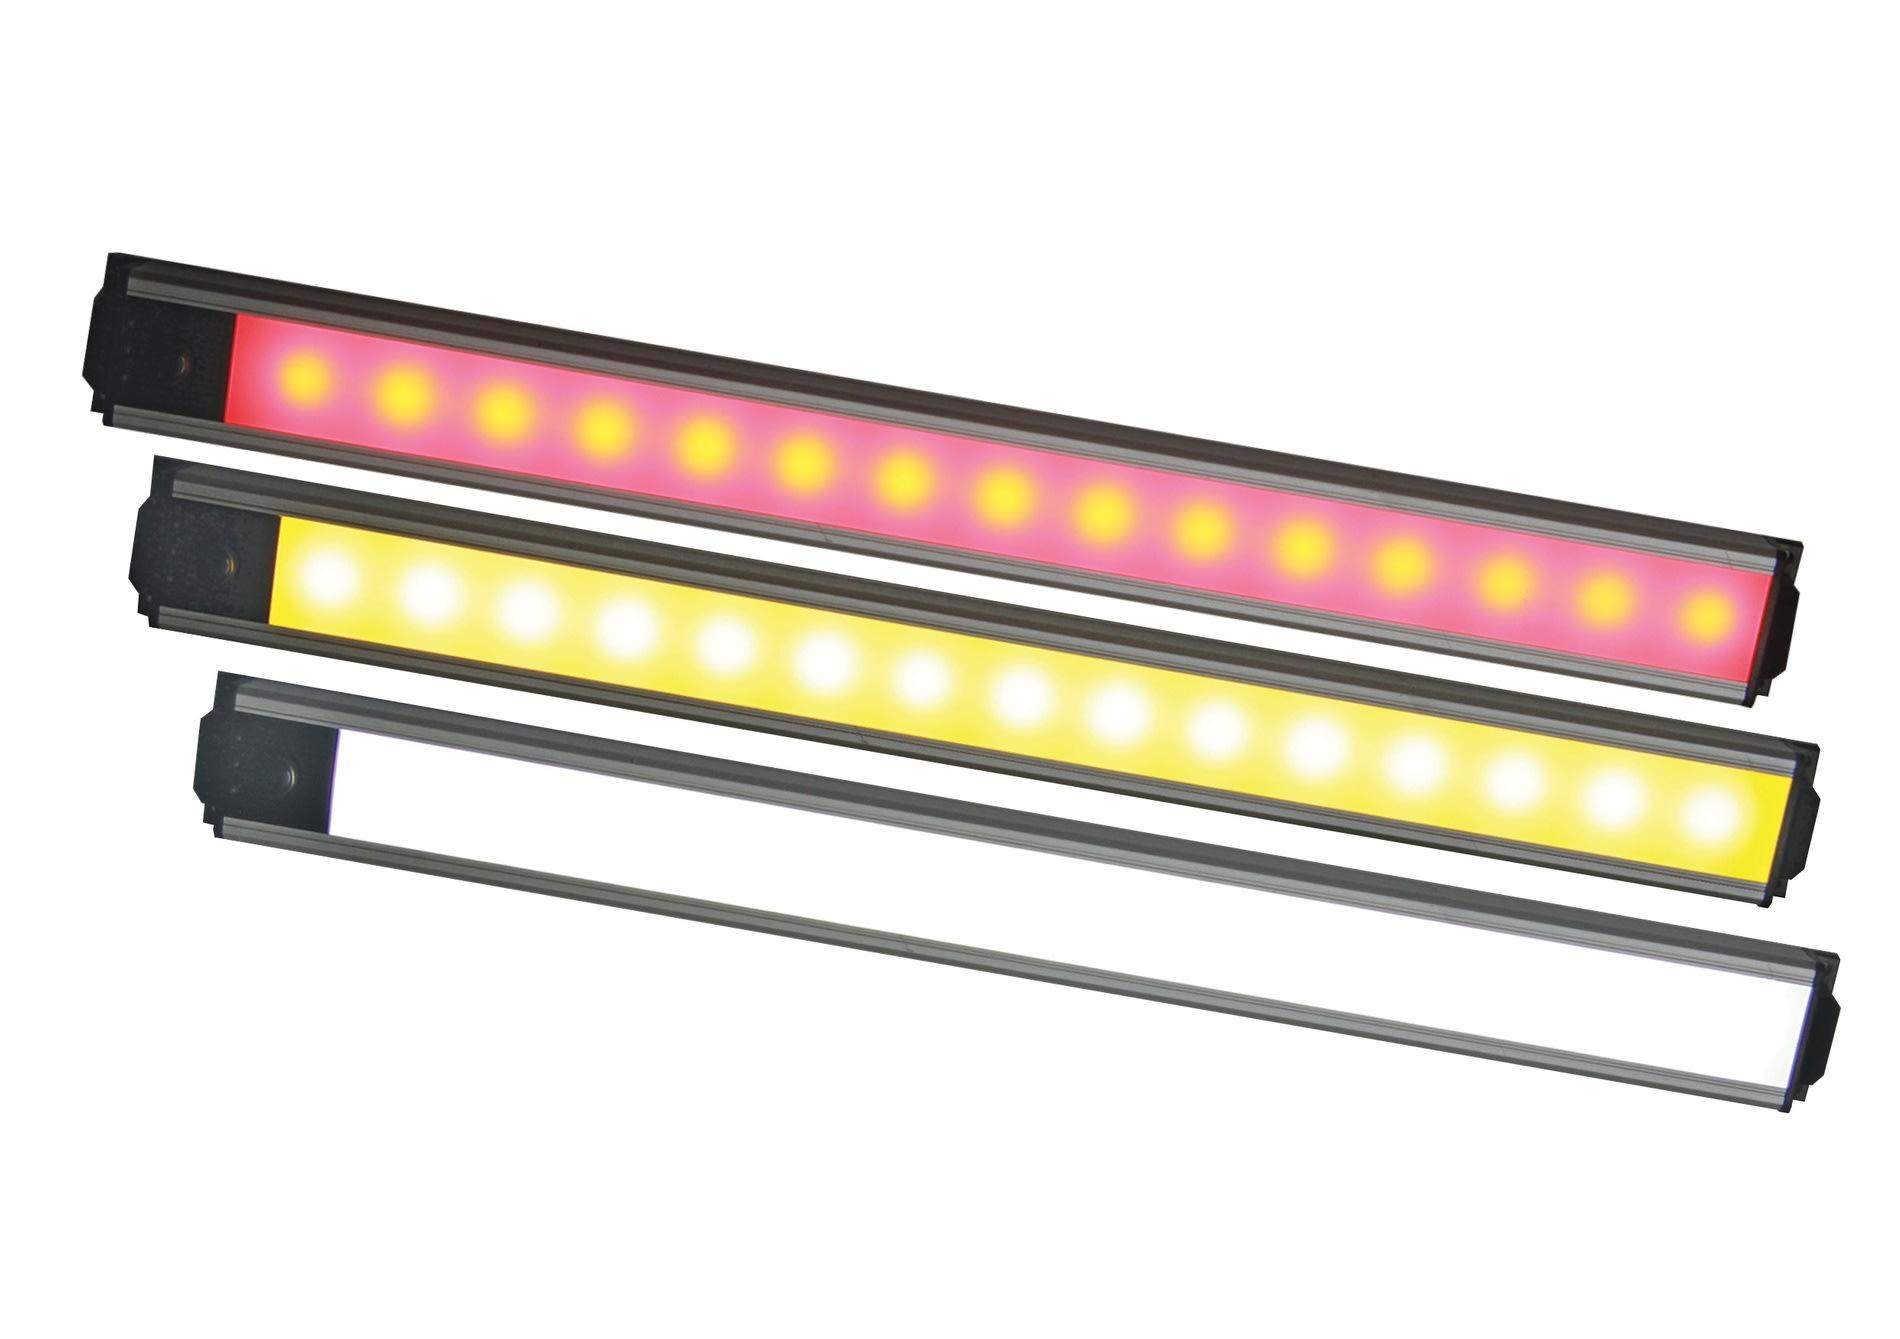 Lighting Fixtures Find Your Light Fixture At Lighting Direct